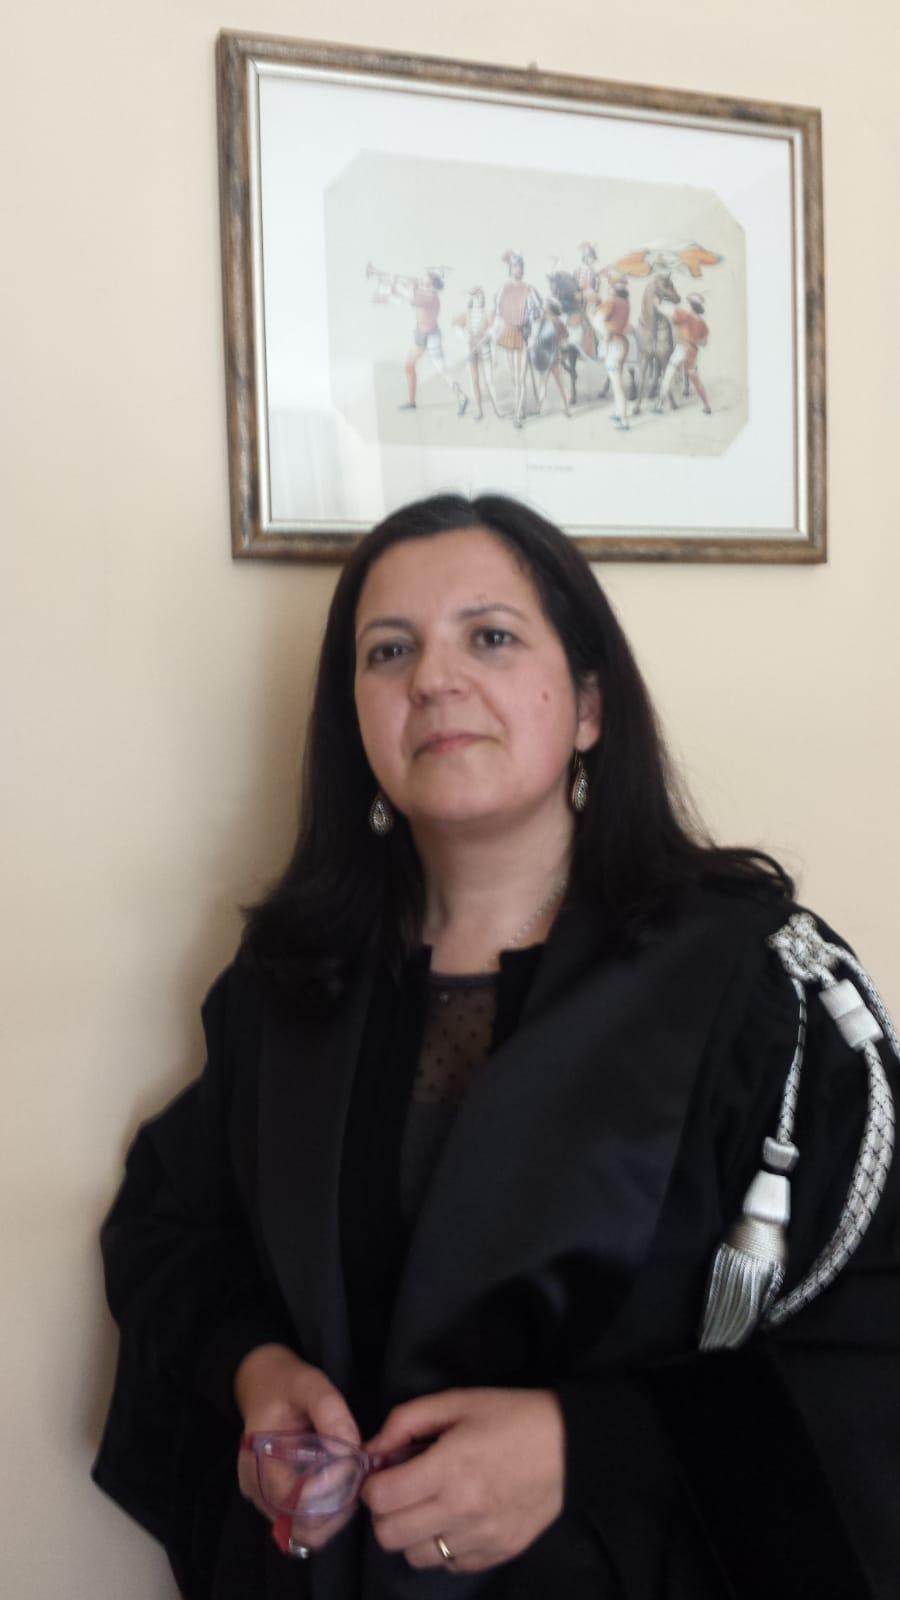 Avv. Angelica GABRIELE